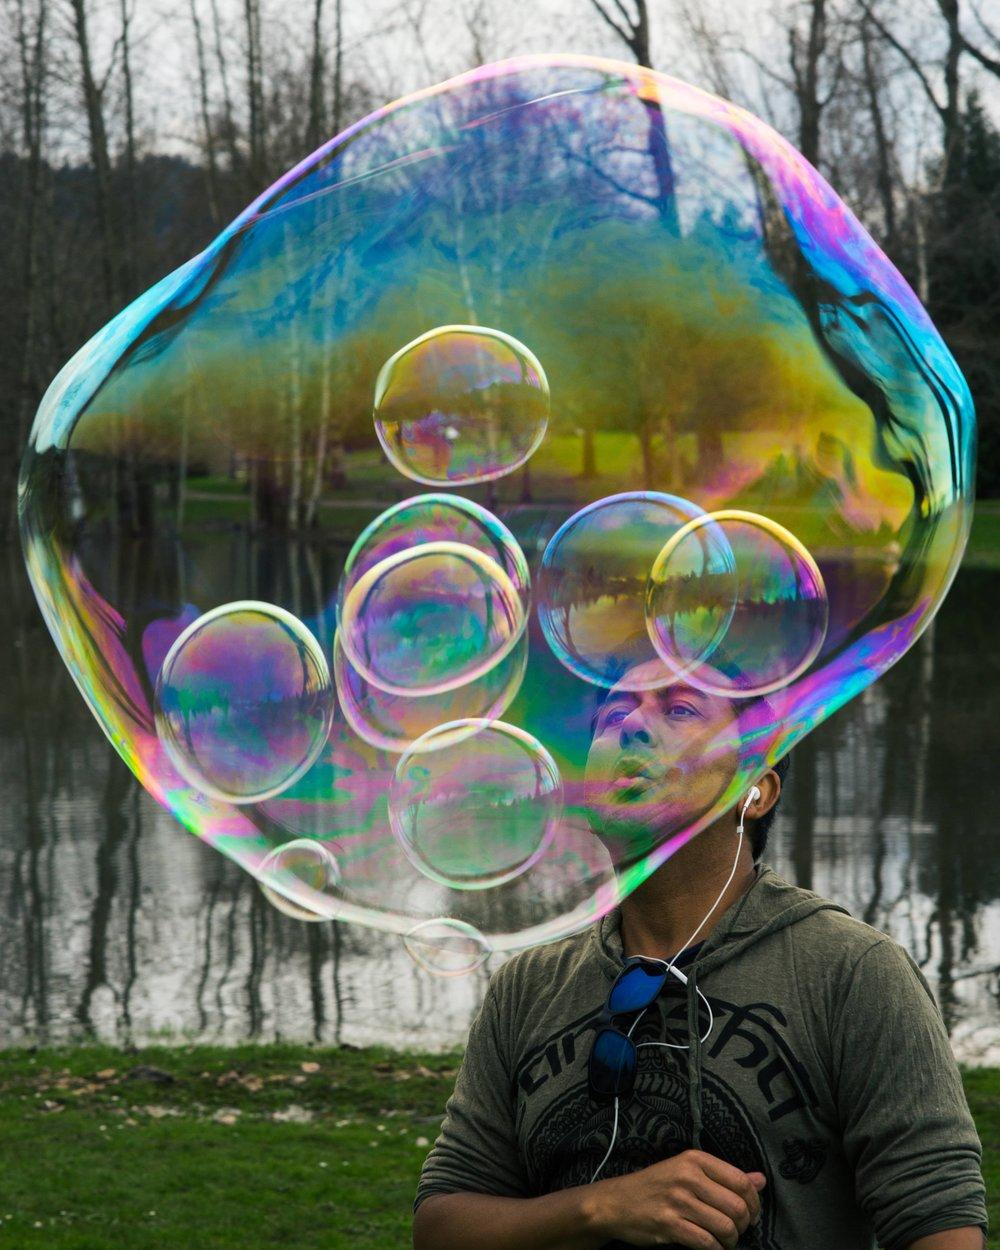 Inception Bubble Boy-7408-min.jpg